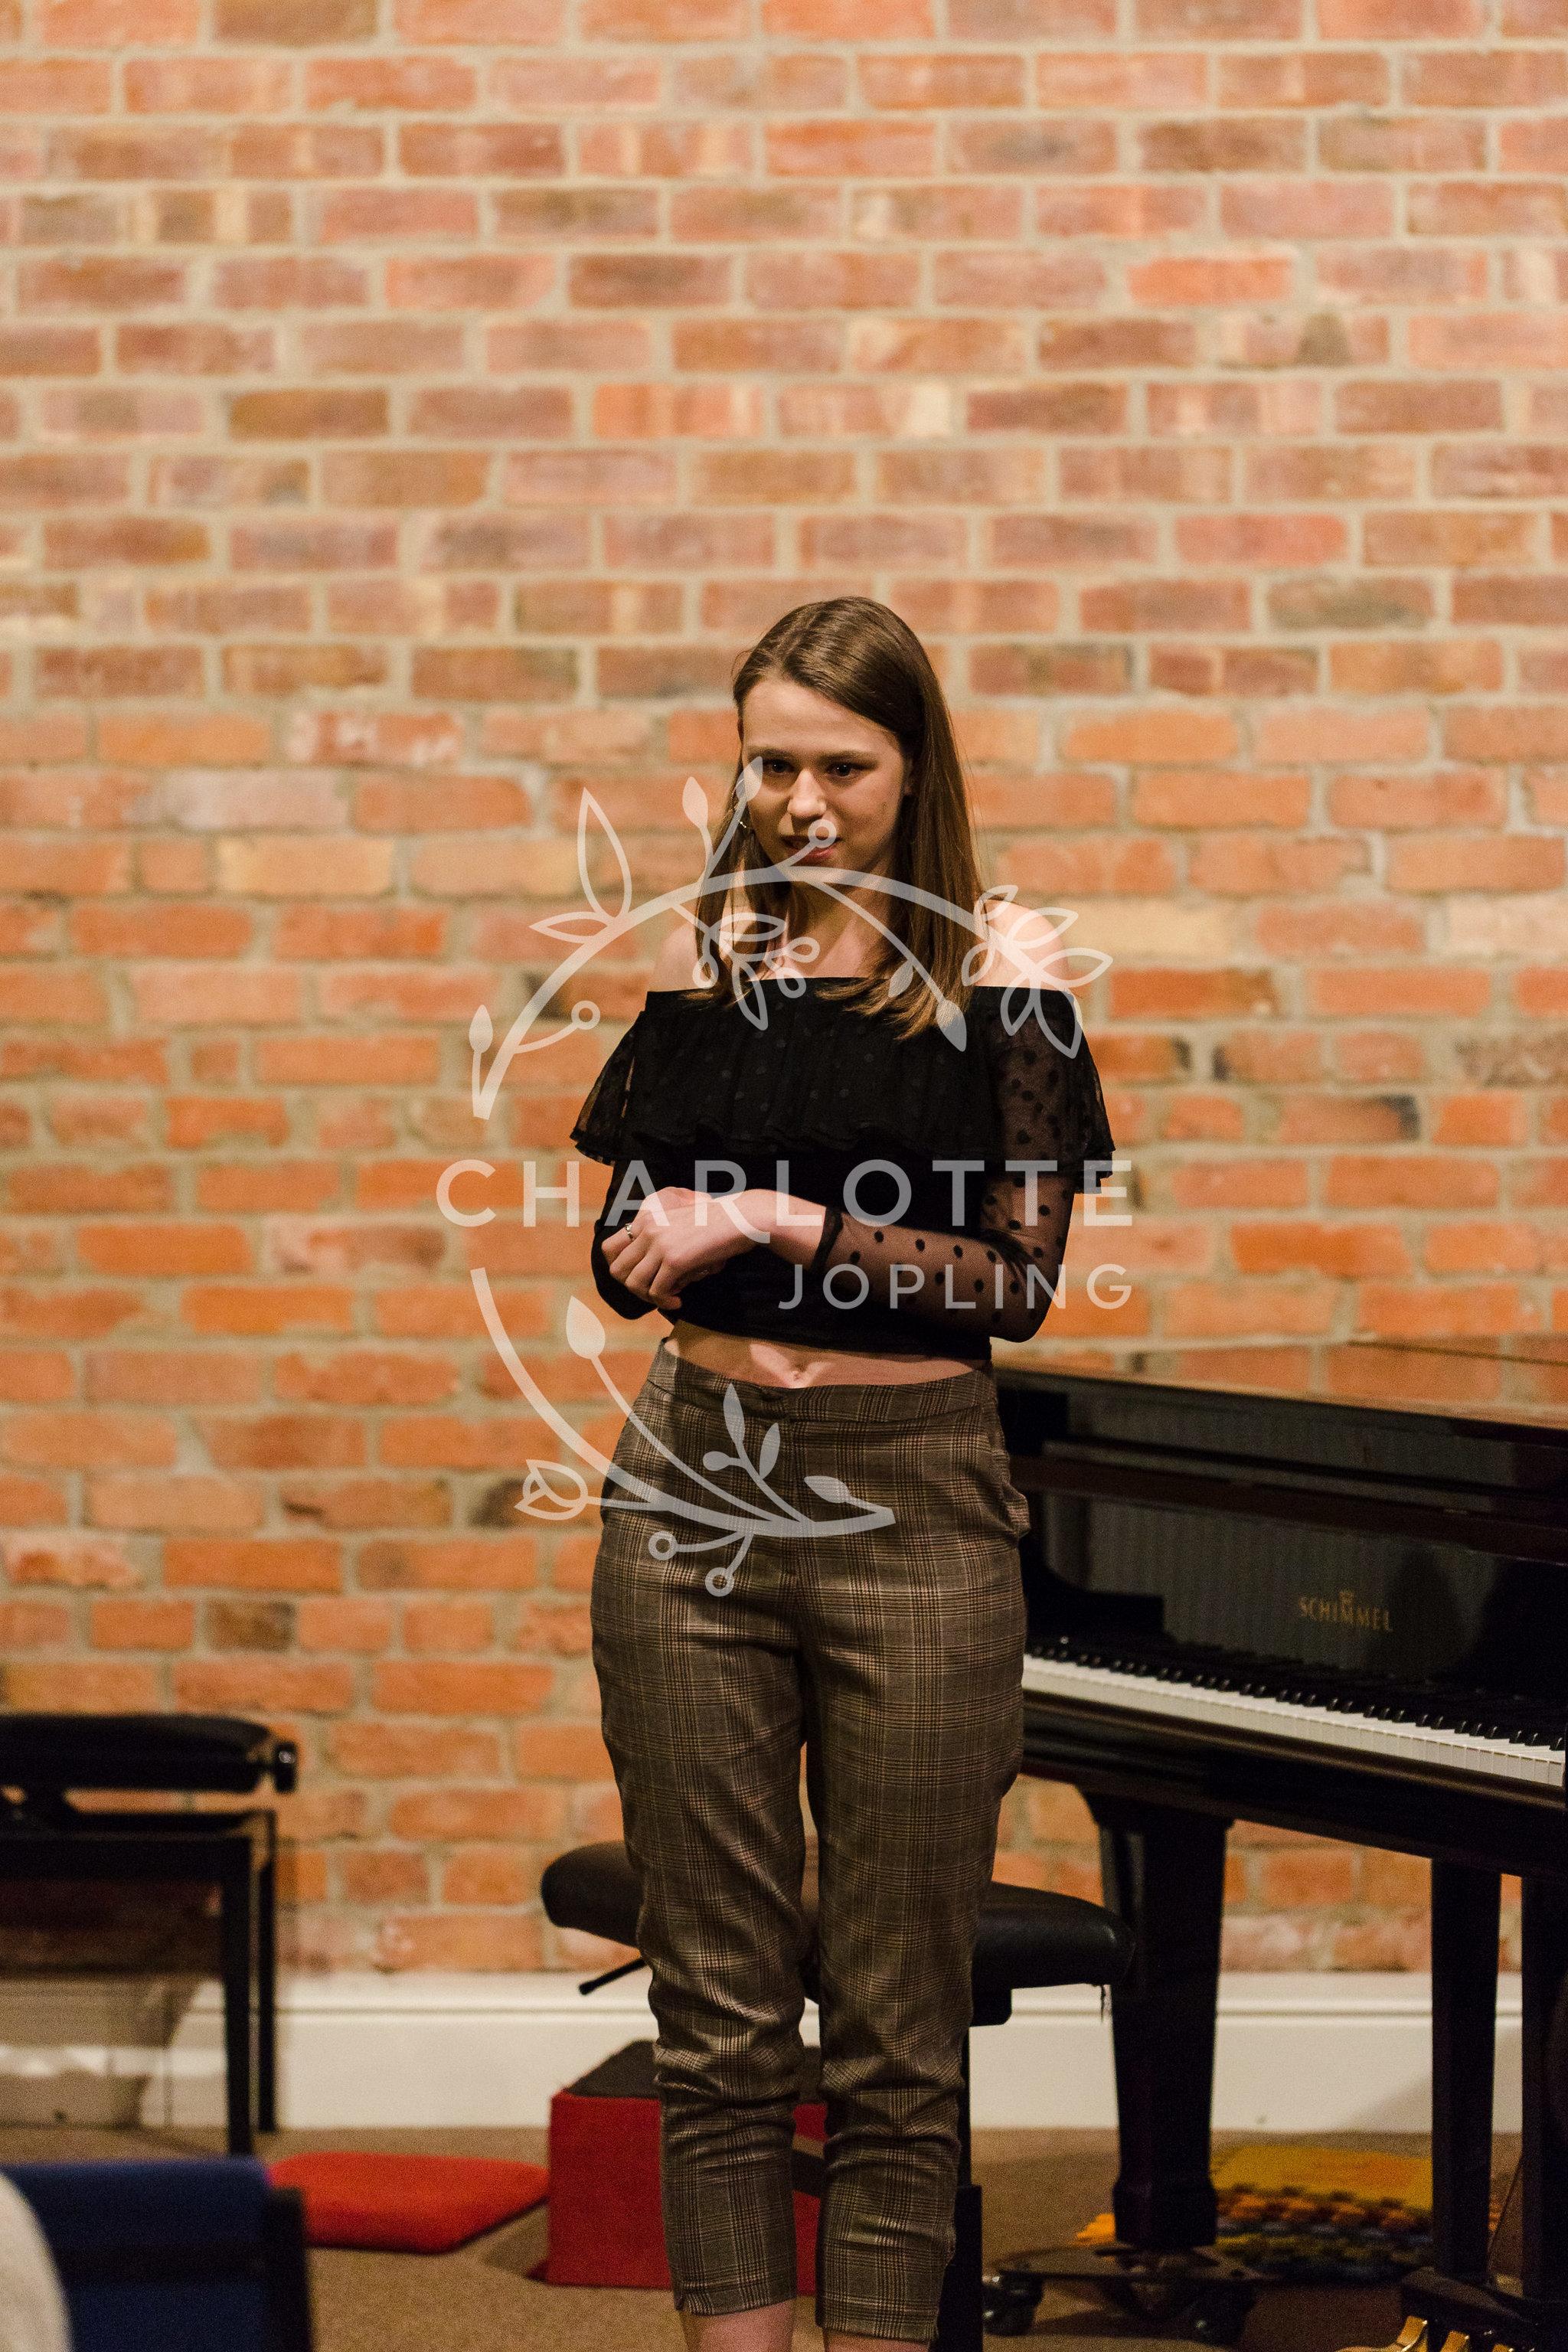 Stepping-Stones-Voicebox-Concert-2018-by-Charlotte-Jopling-91.jpg